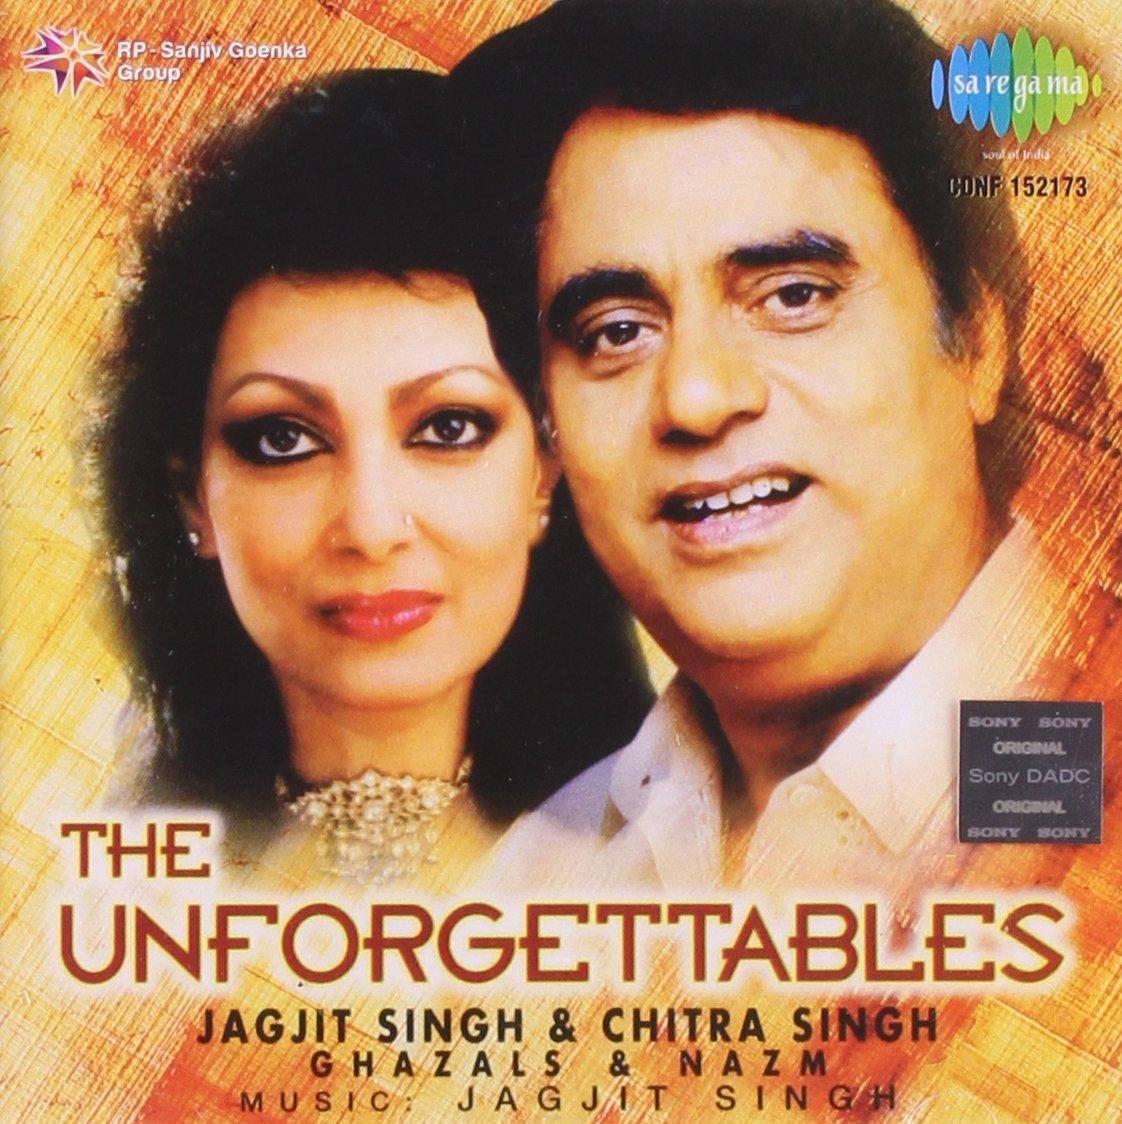 unforgettables chitra singh jagjit singh